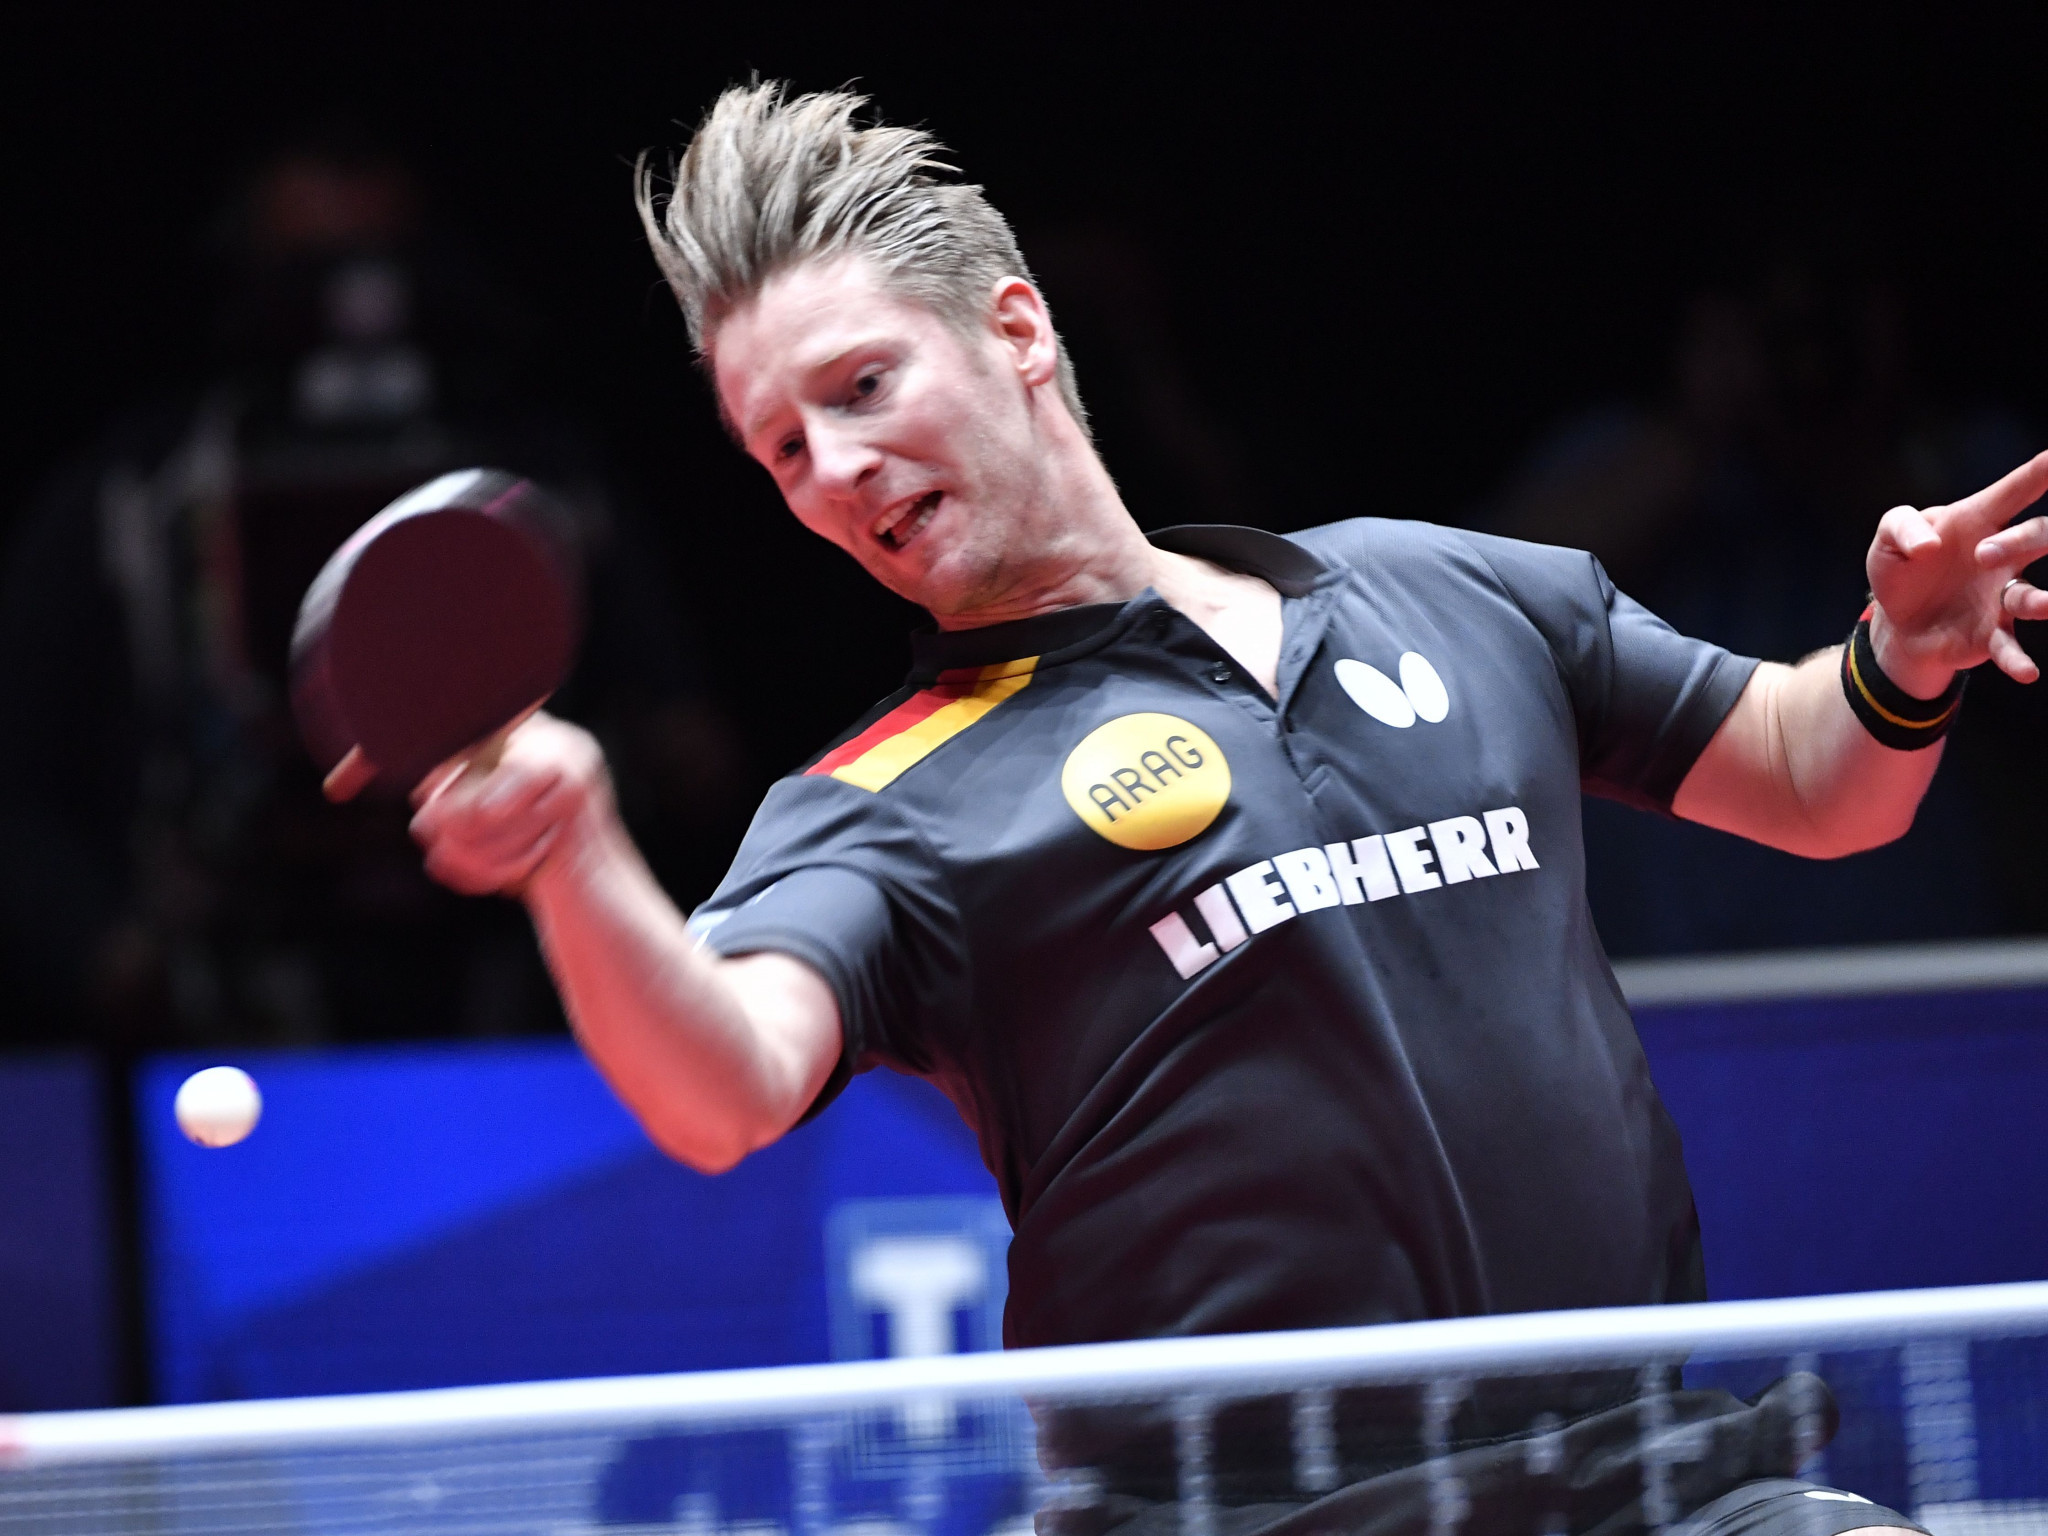 Düsseldorf and Durban set for virtual bidding war for 2023 World Table Tennis Championships